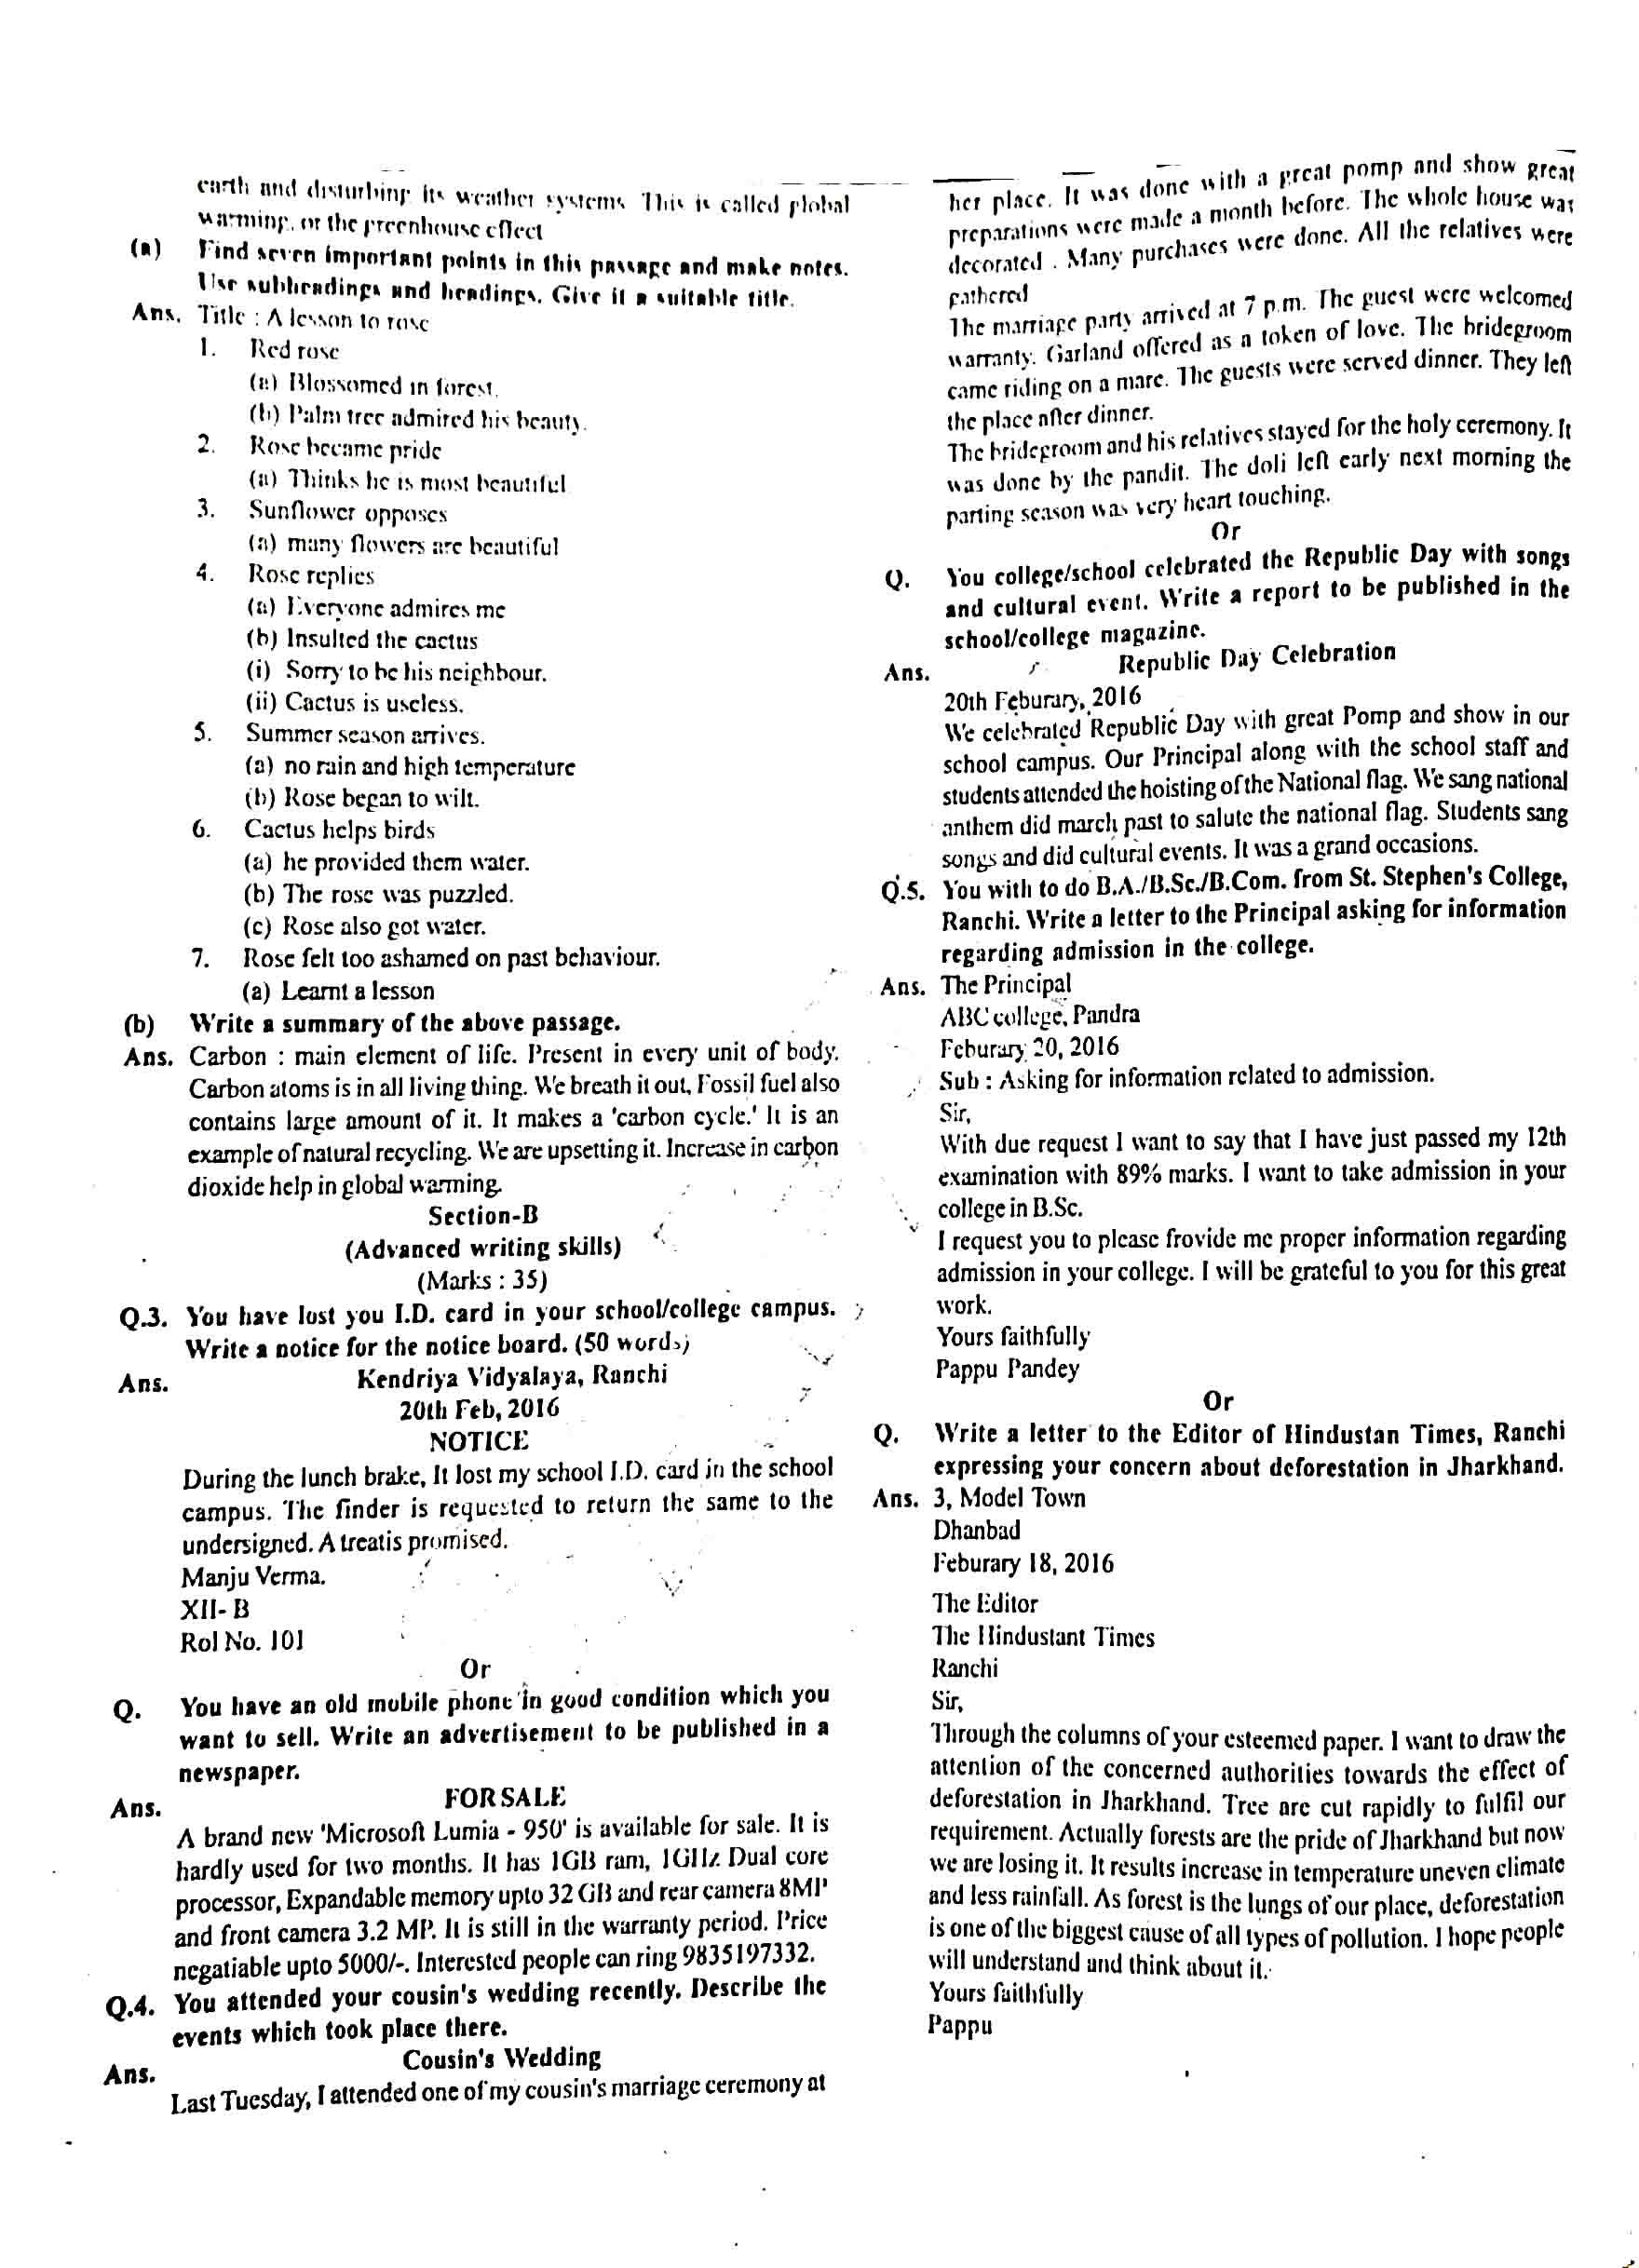 JAC Class 12 english-core 2016 Question Paper 02